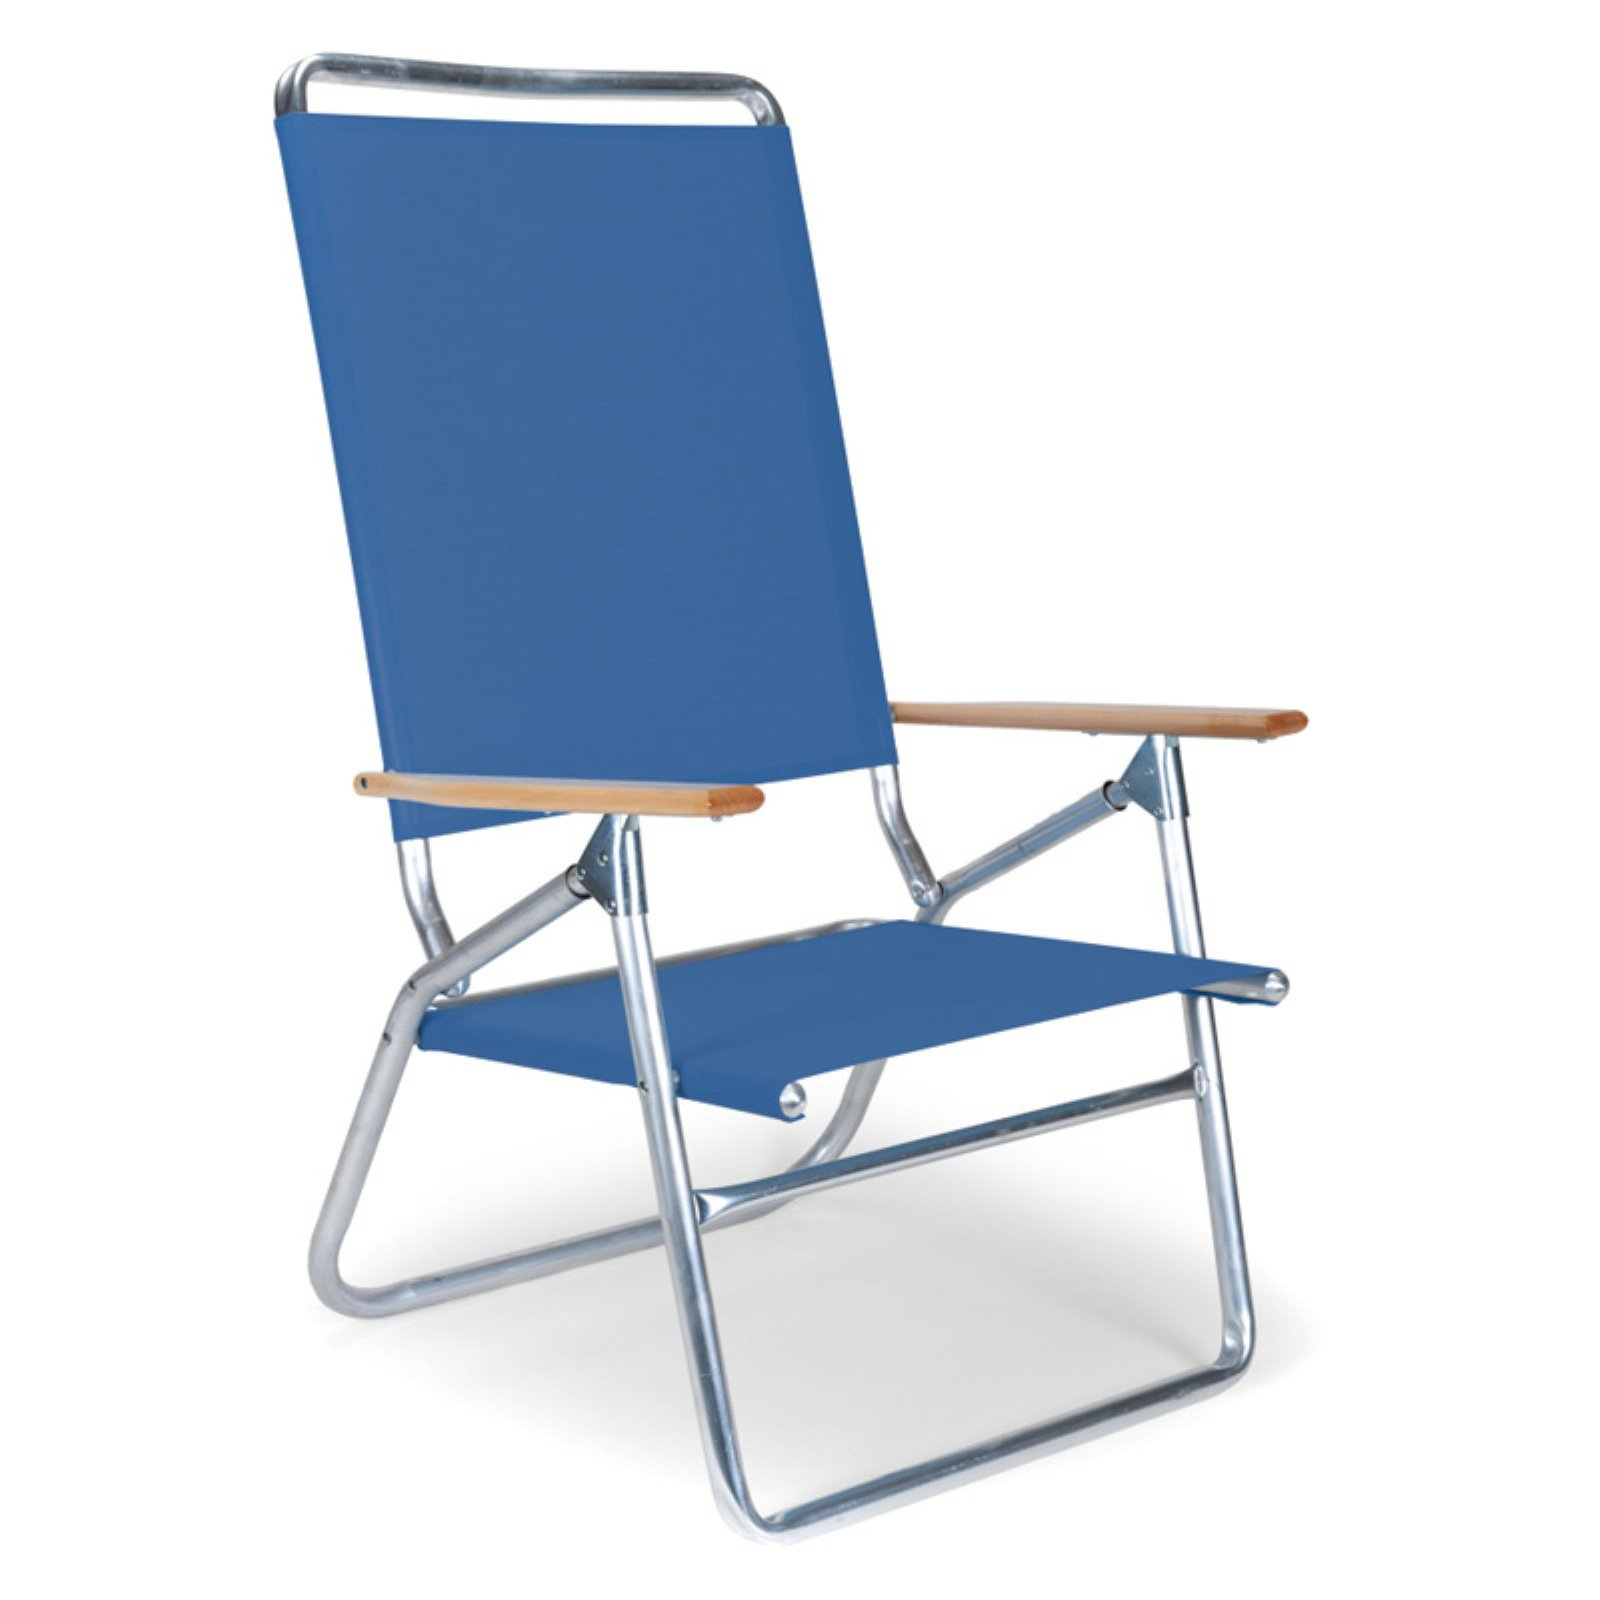 telescope beach chairs with wheels energi 24 posture task chair foldable light 39 n easy high boy silver aluminum frame walmart com